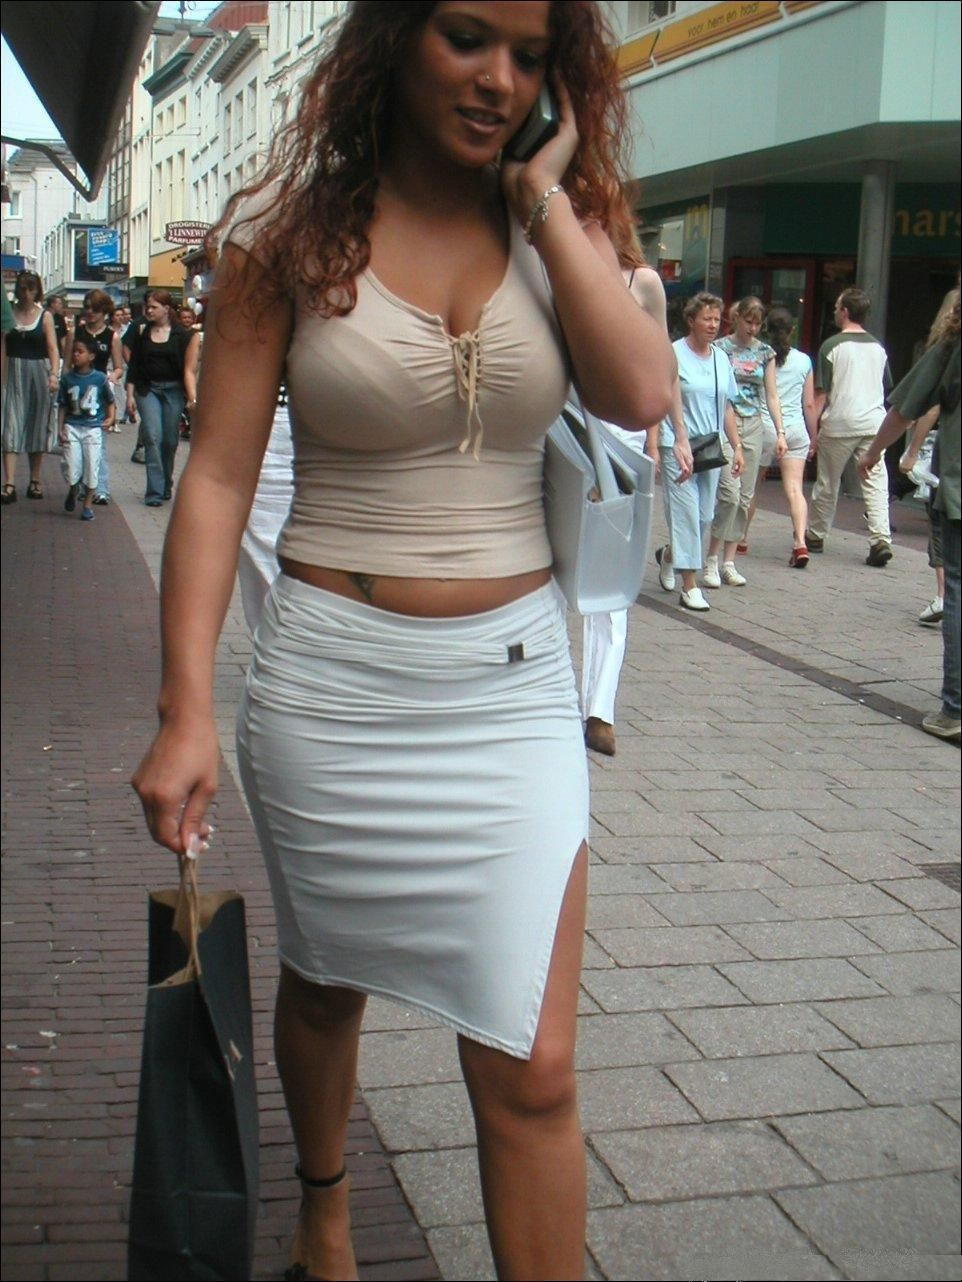 JustBIG boobs : Photo | Busty Street | Pinterest